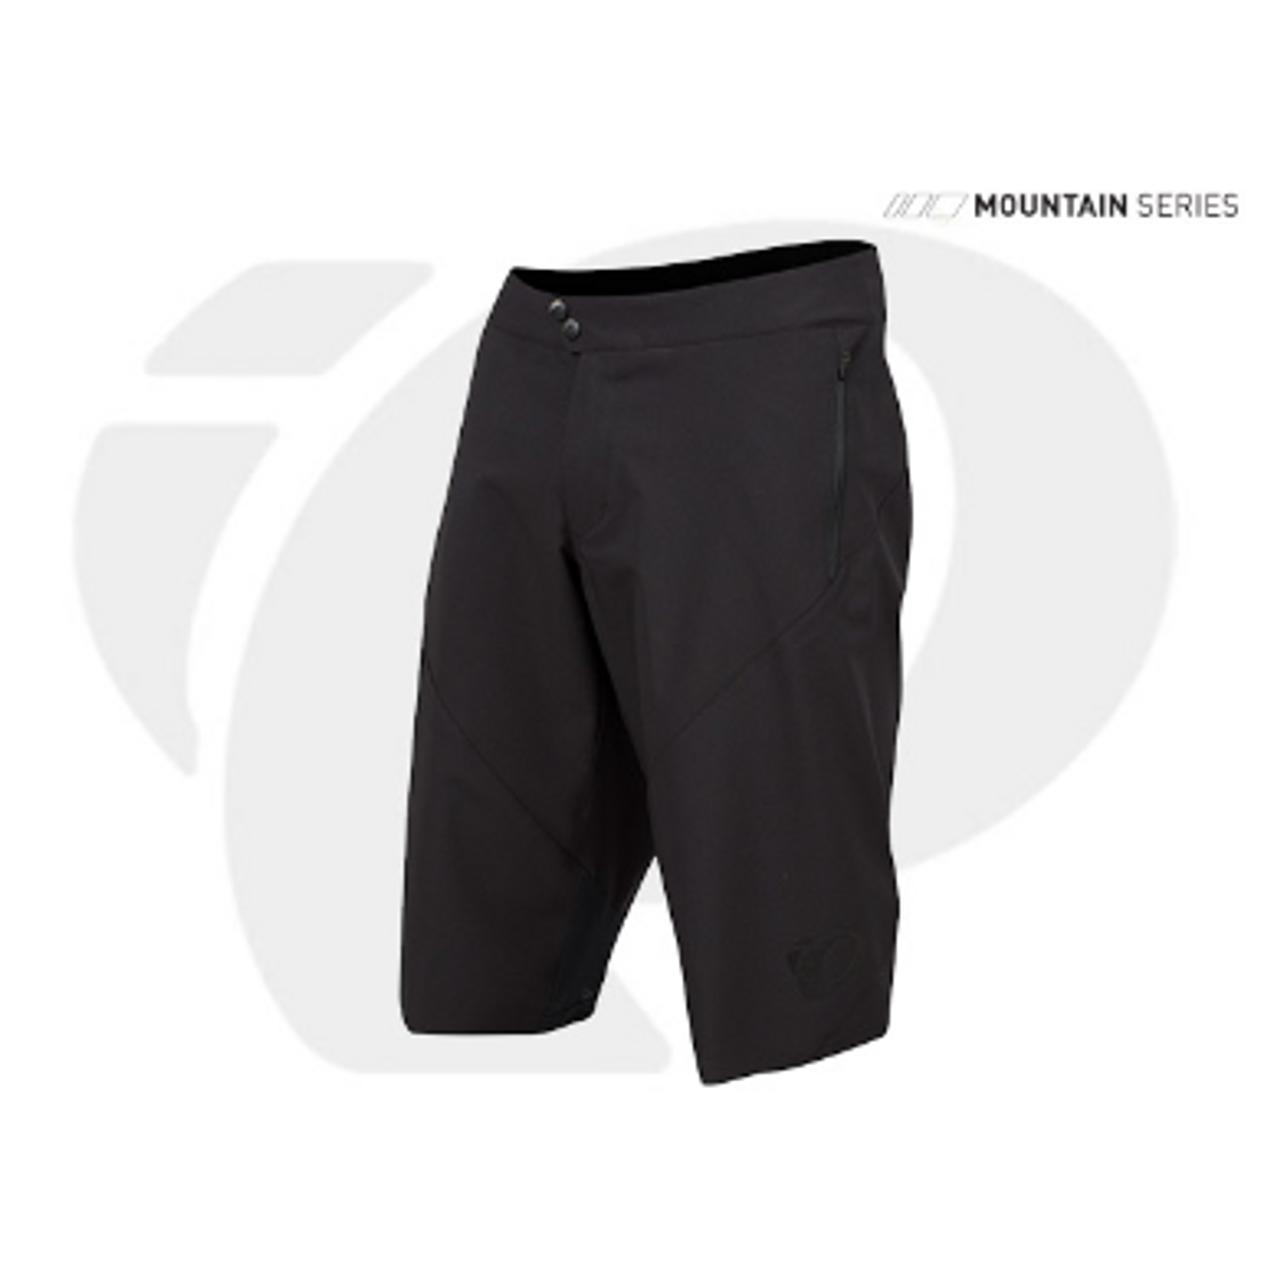 Pearl Izumi Elevate Shorts